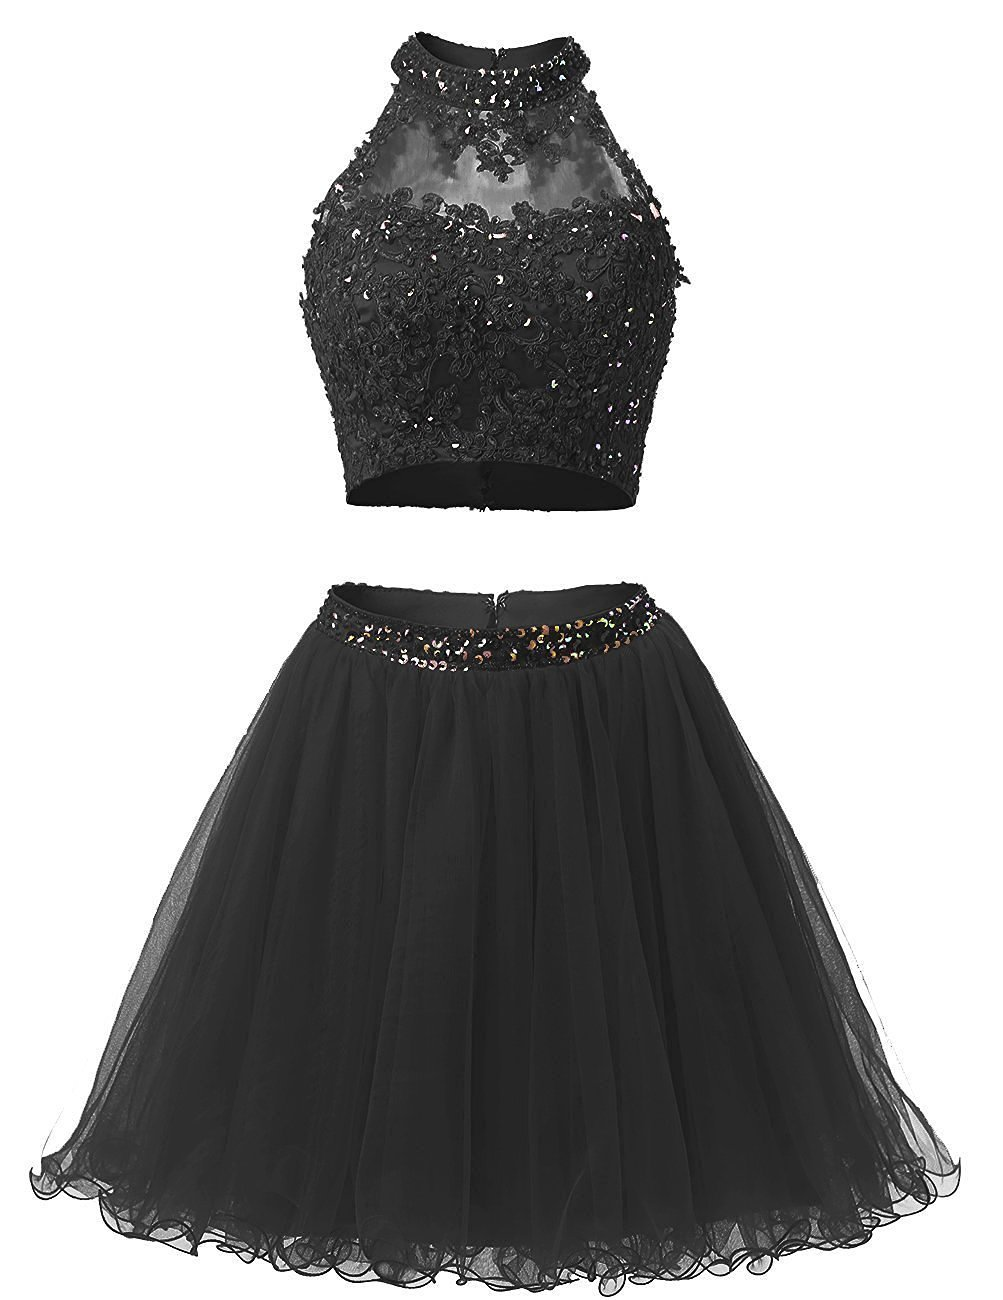 2 Piece Formal Black Dresses: Amazon.com